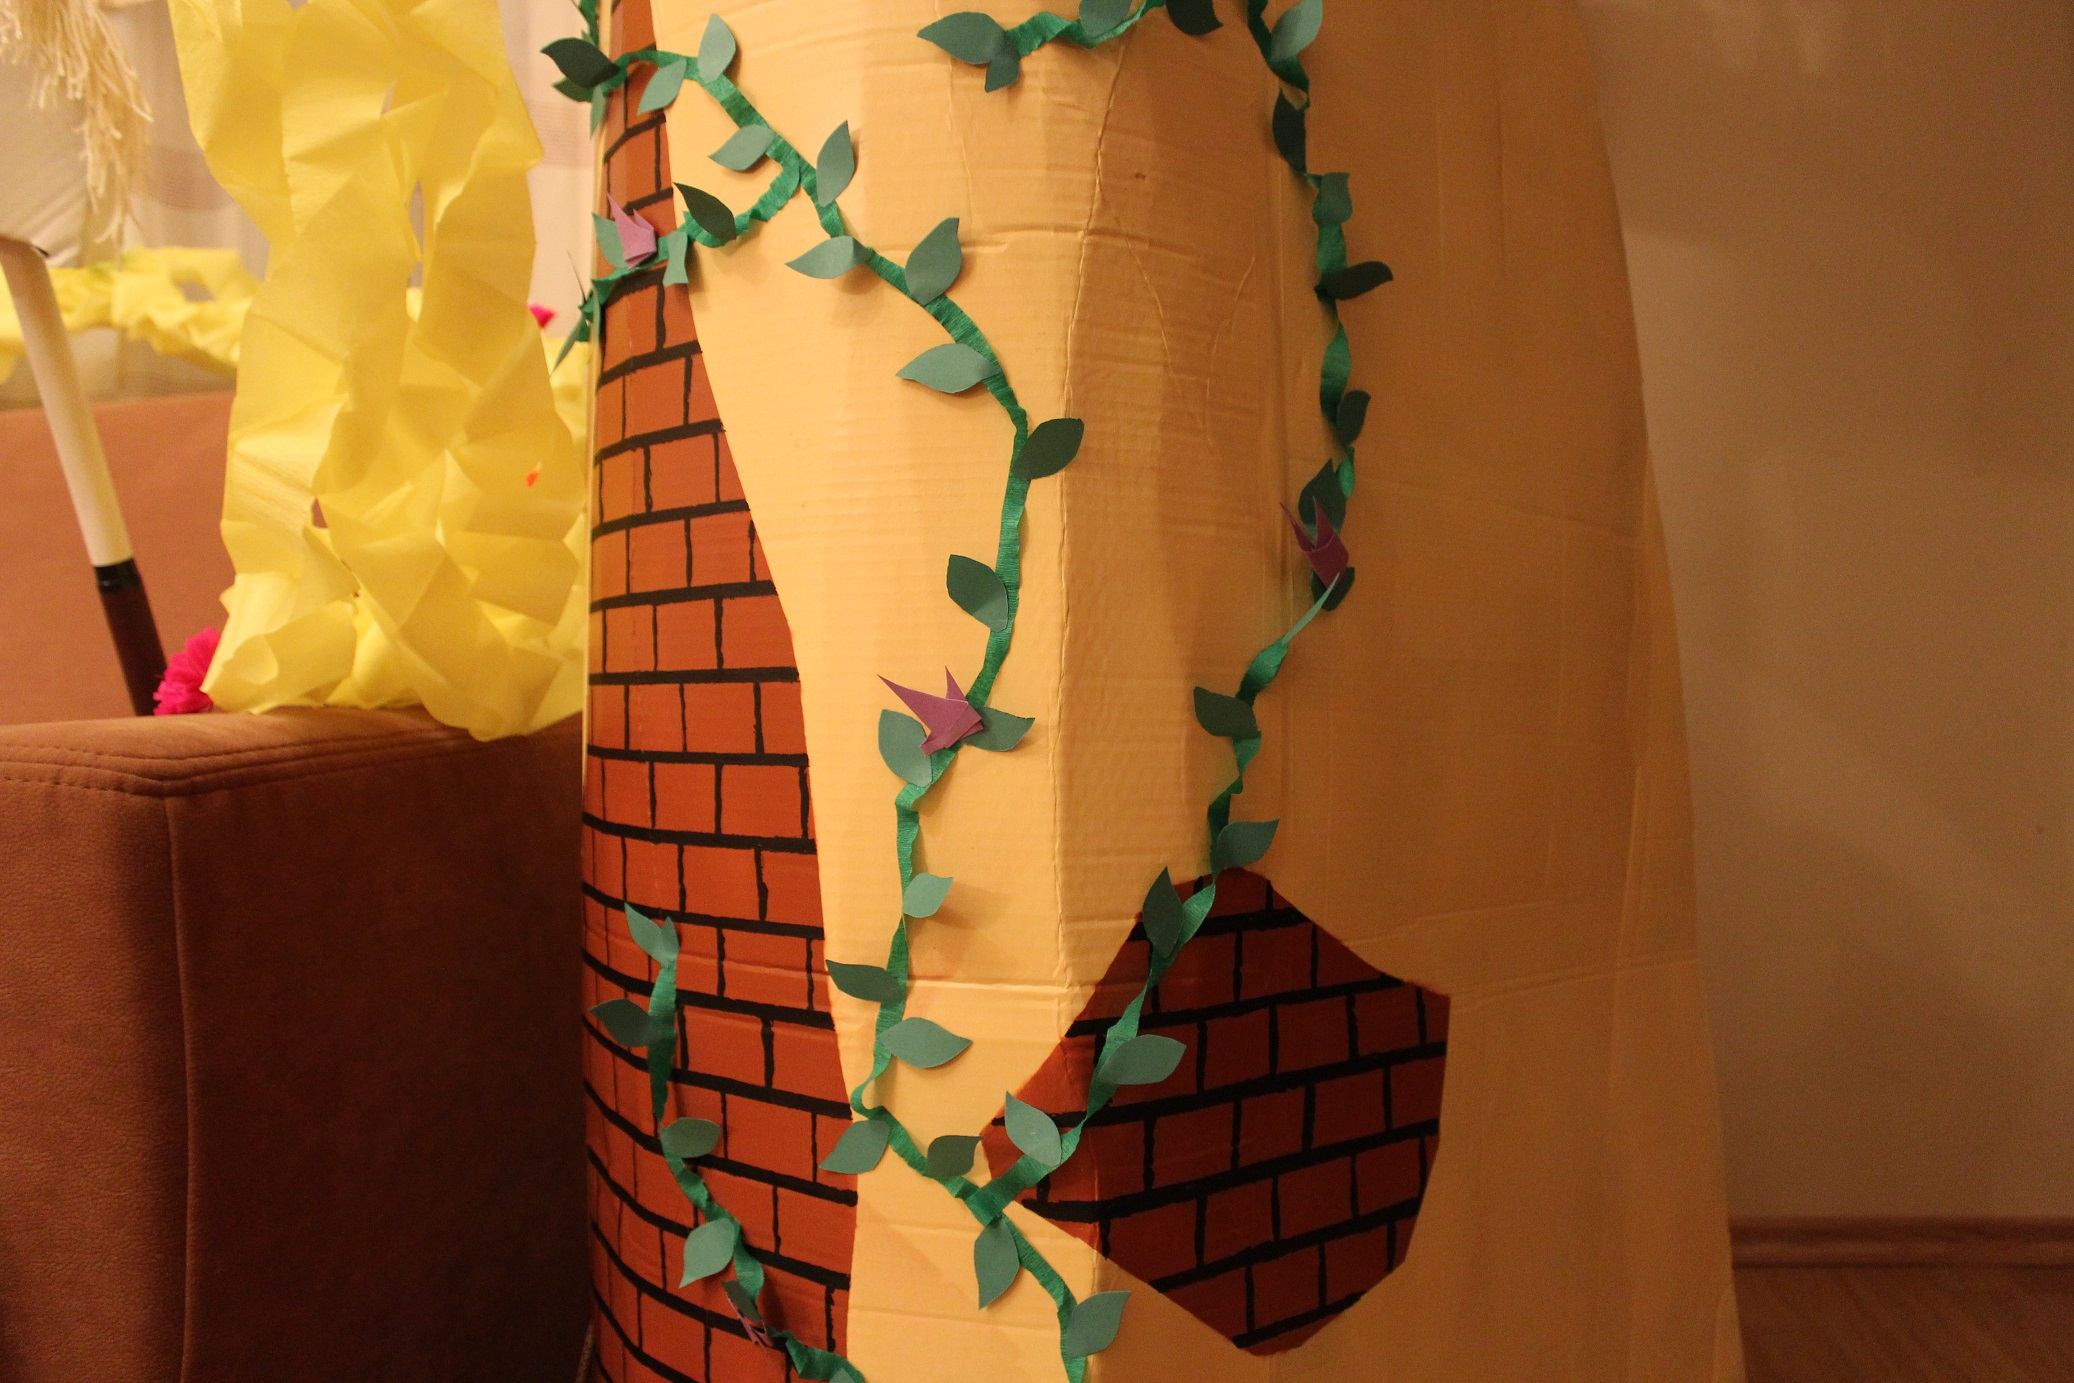 szmk_tangled_aranyhaj_birthday_party_szulinap_dekor_buli_13.JPG